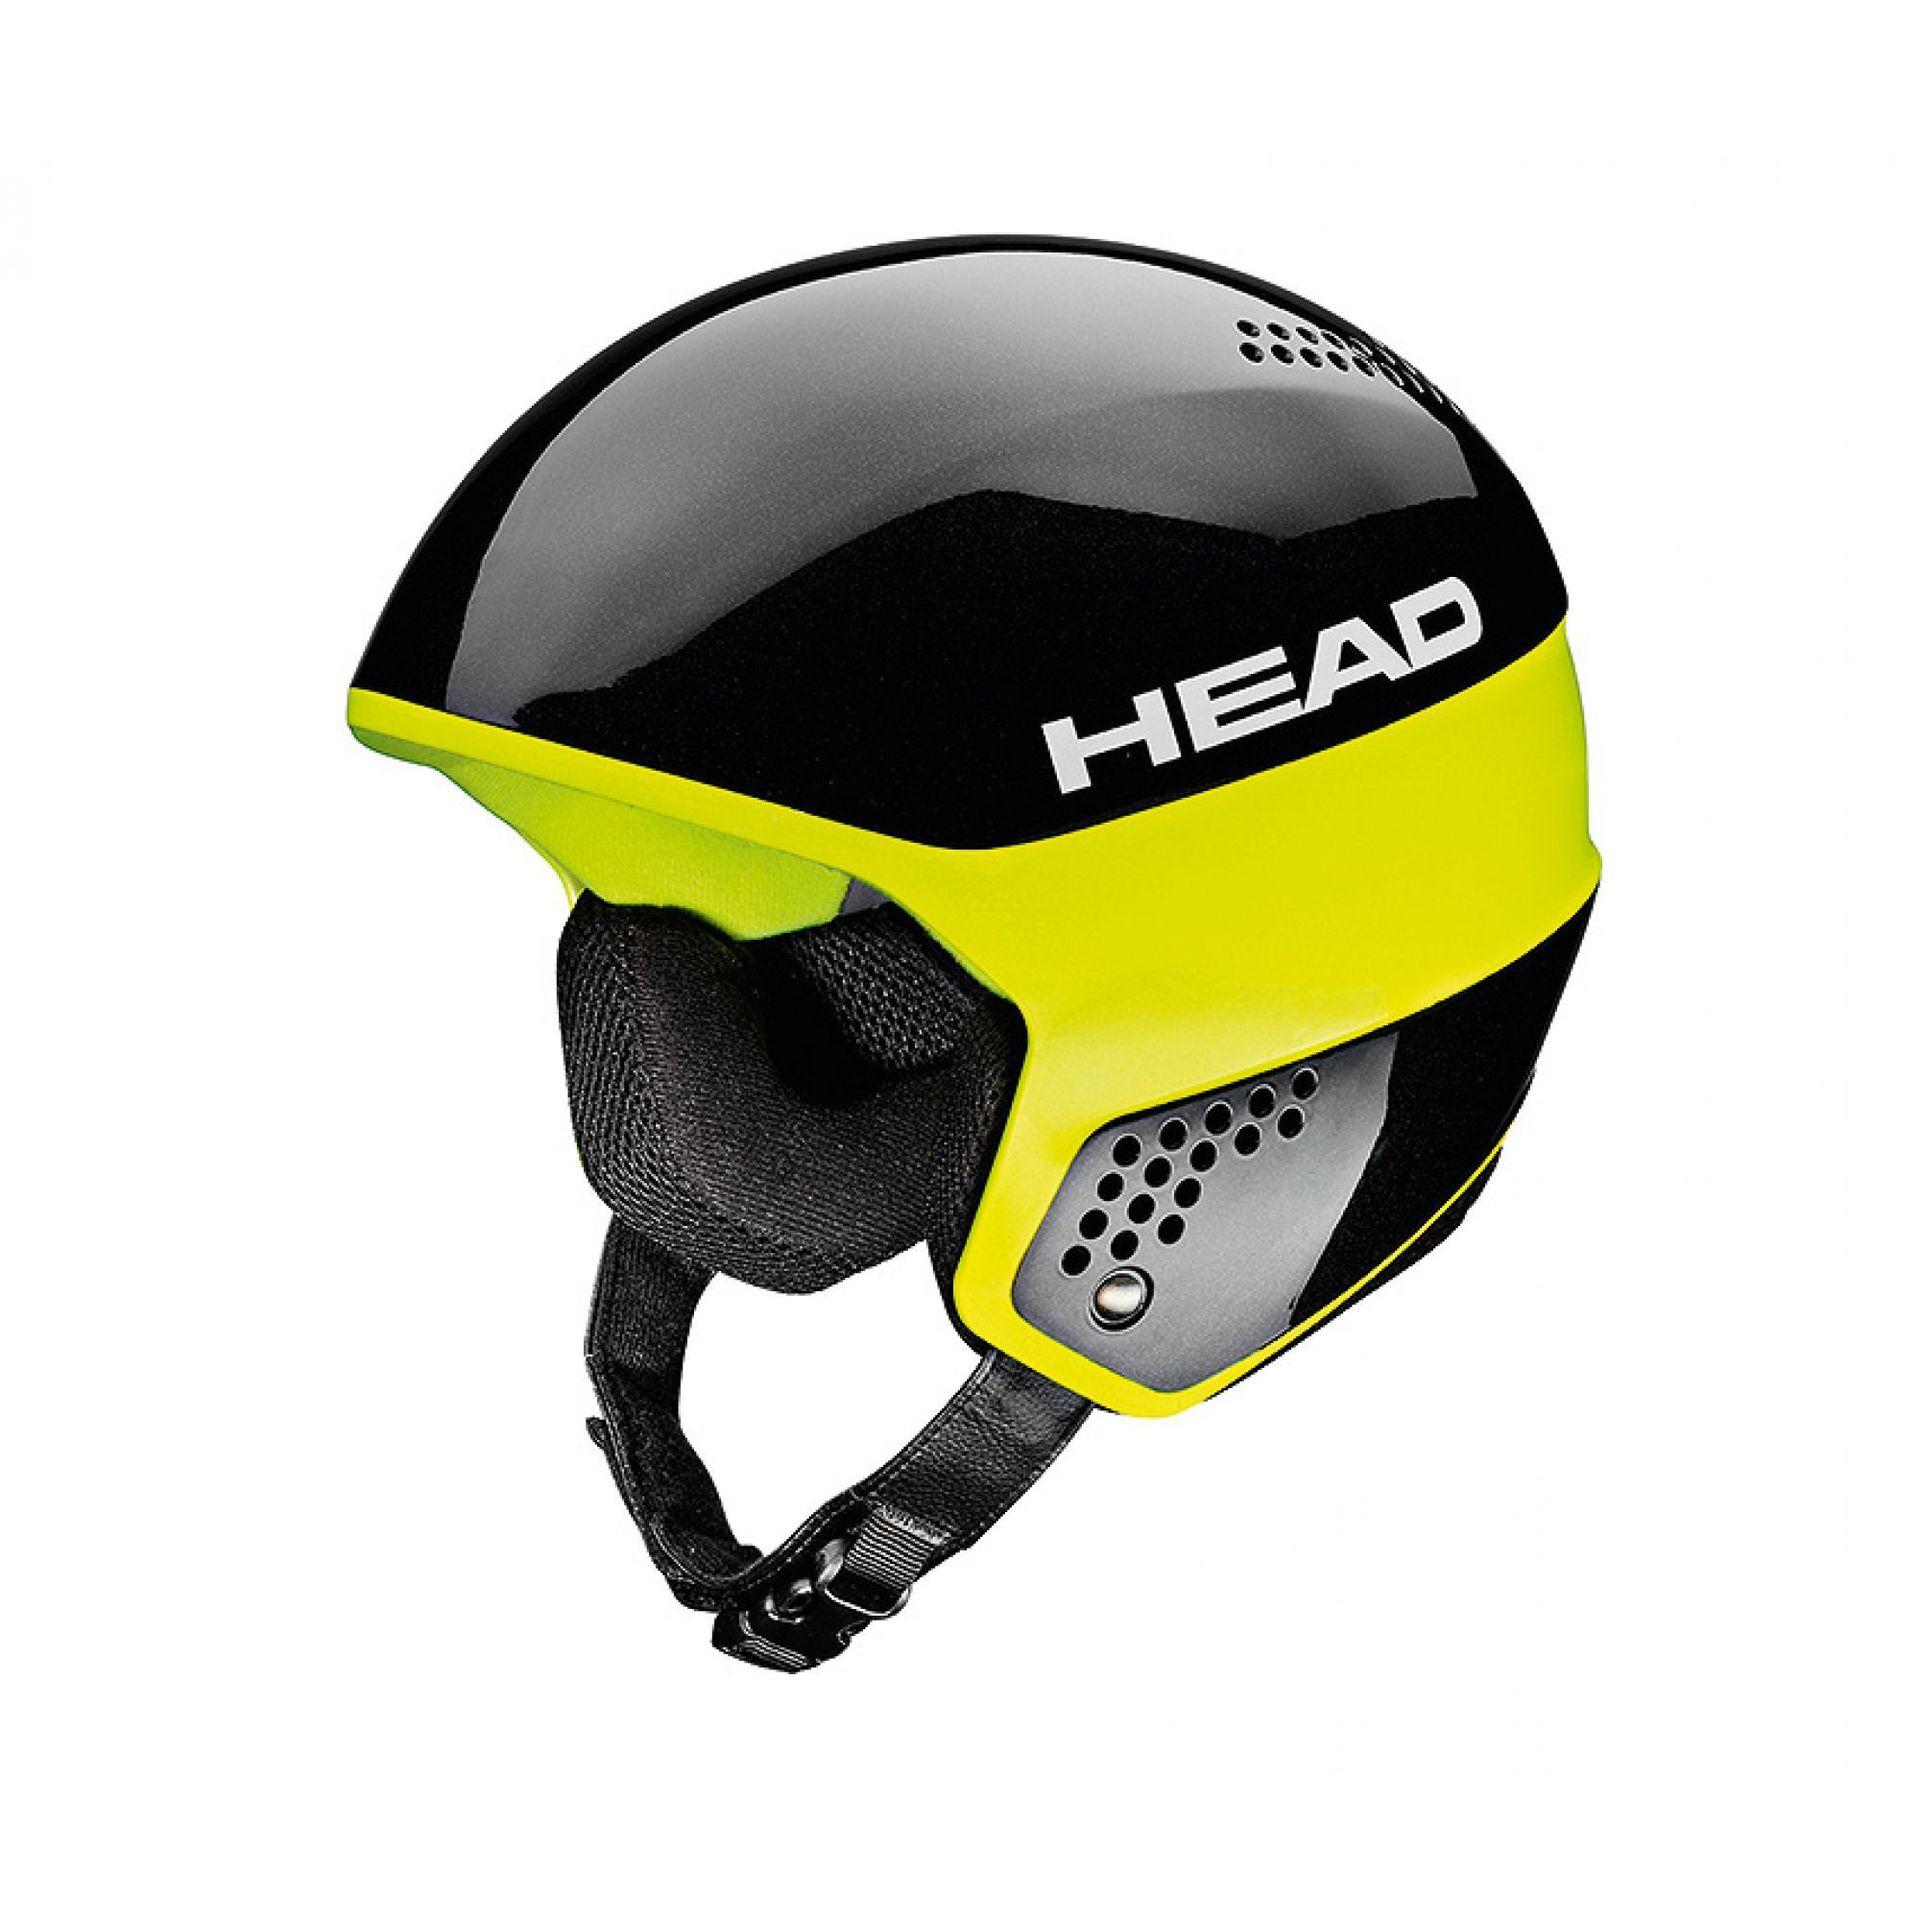 KASK HEAD STIVOT RACE BLACK 2